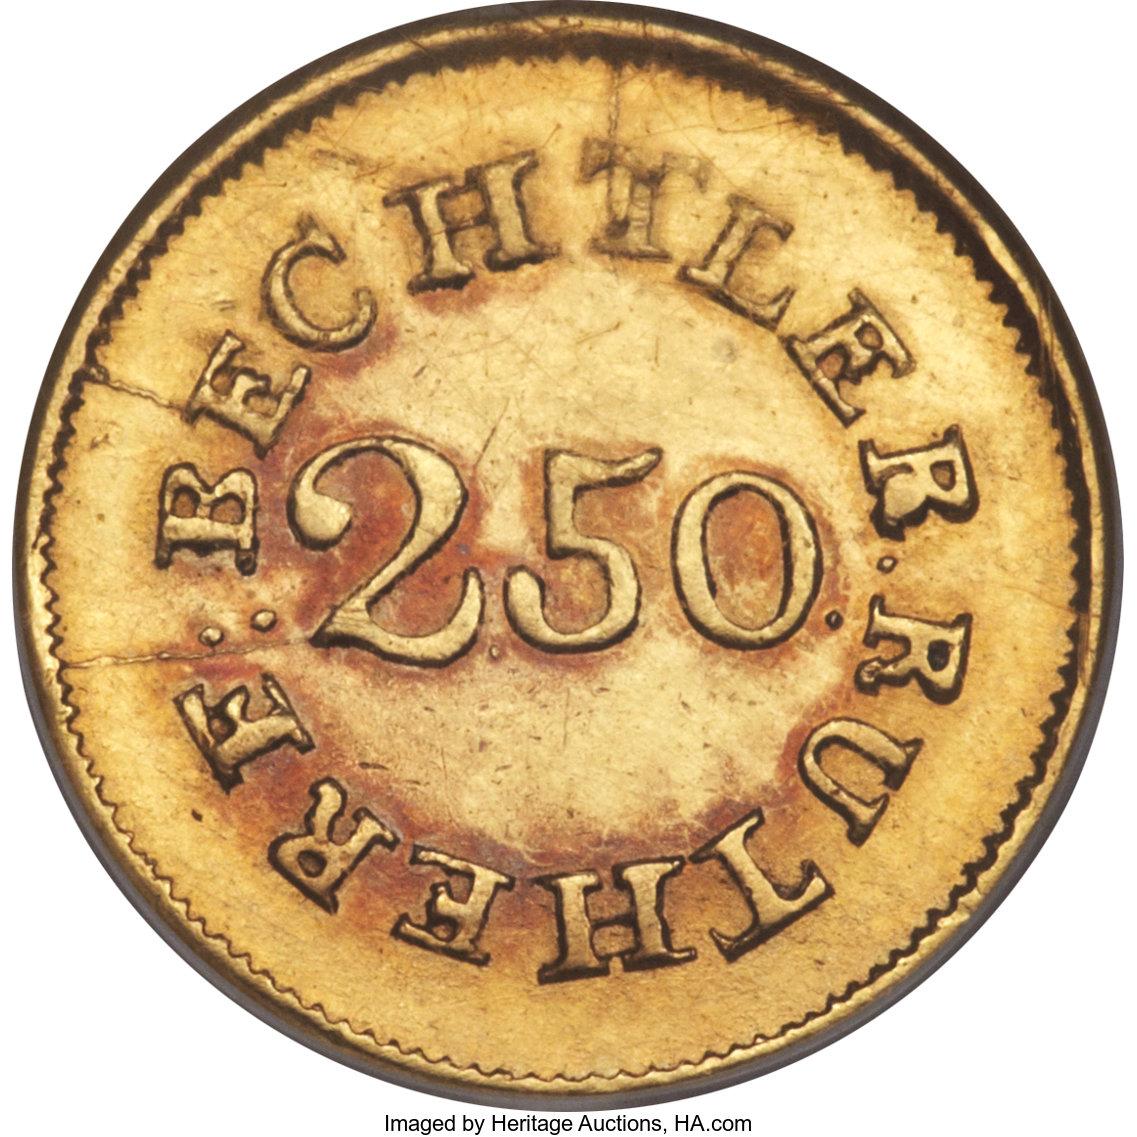 sample image for C.Becht $2 1/2 Even 22 (K-12)